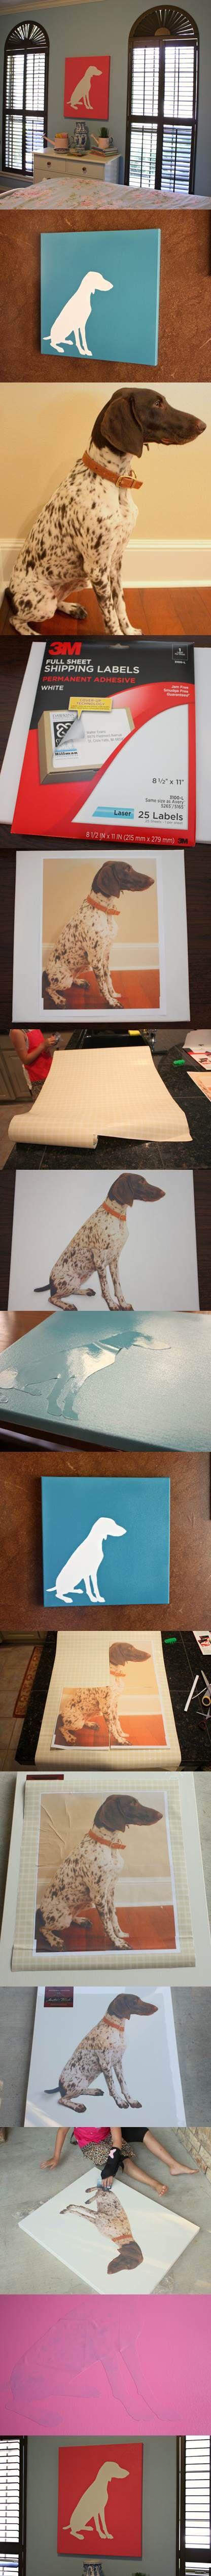 DIY Dog Silhouette Art 2